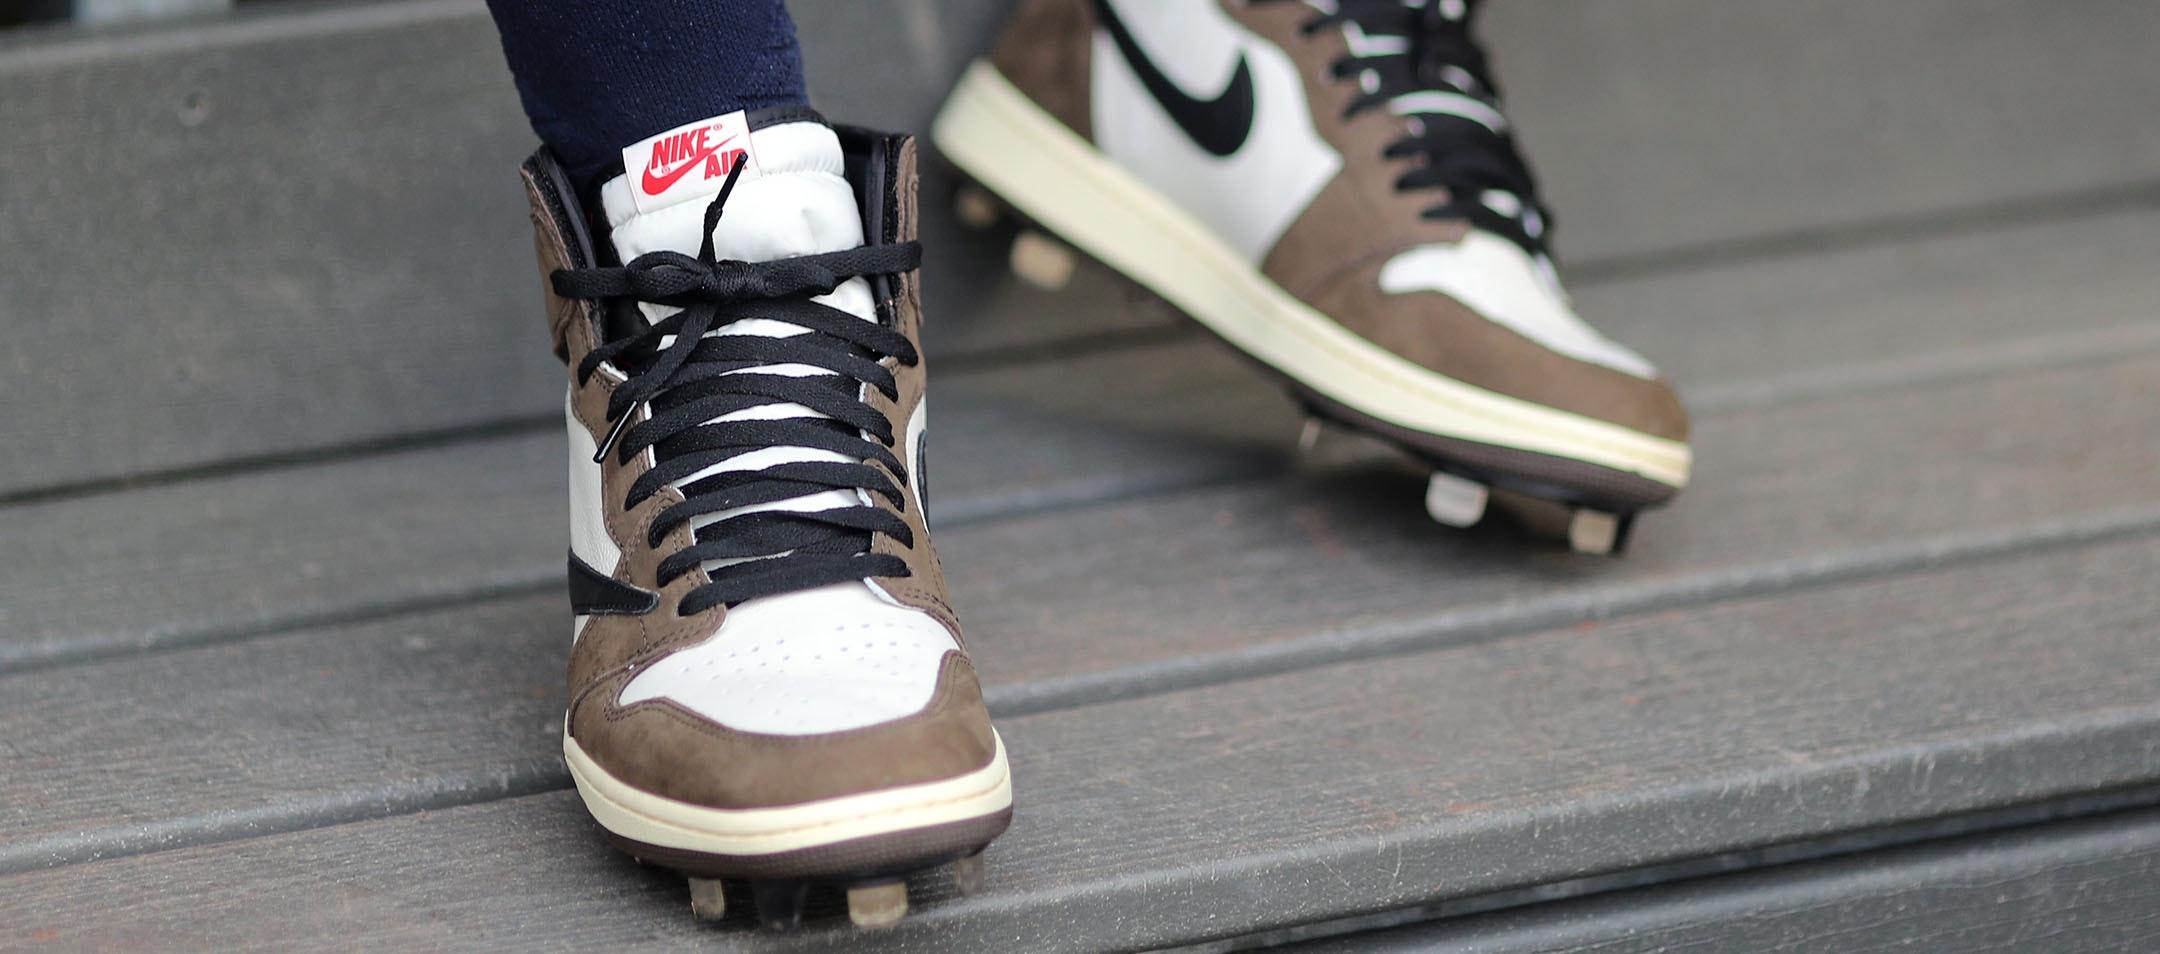 Custom Cleats Is Reinventing Baseball